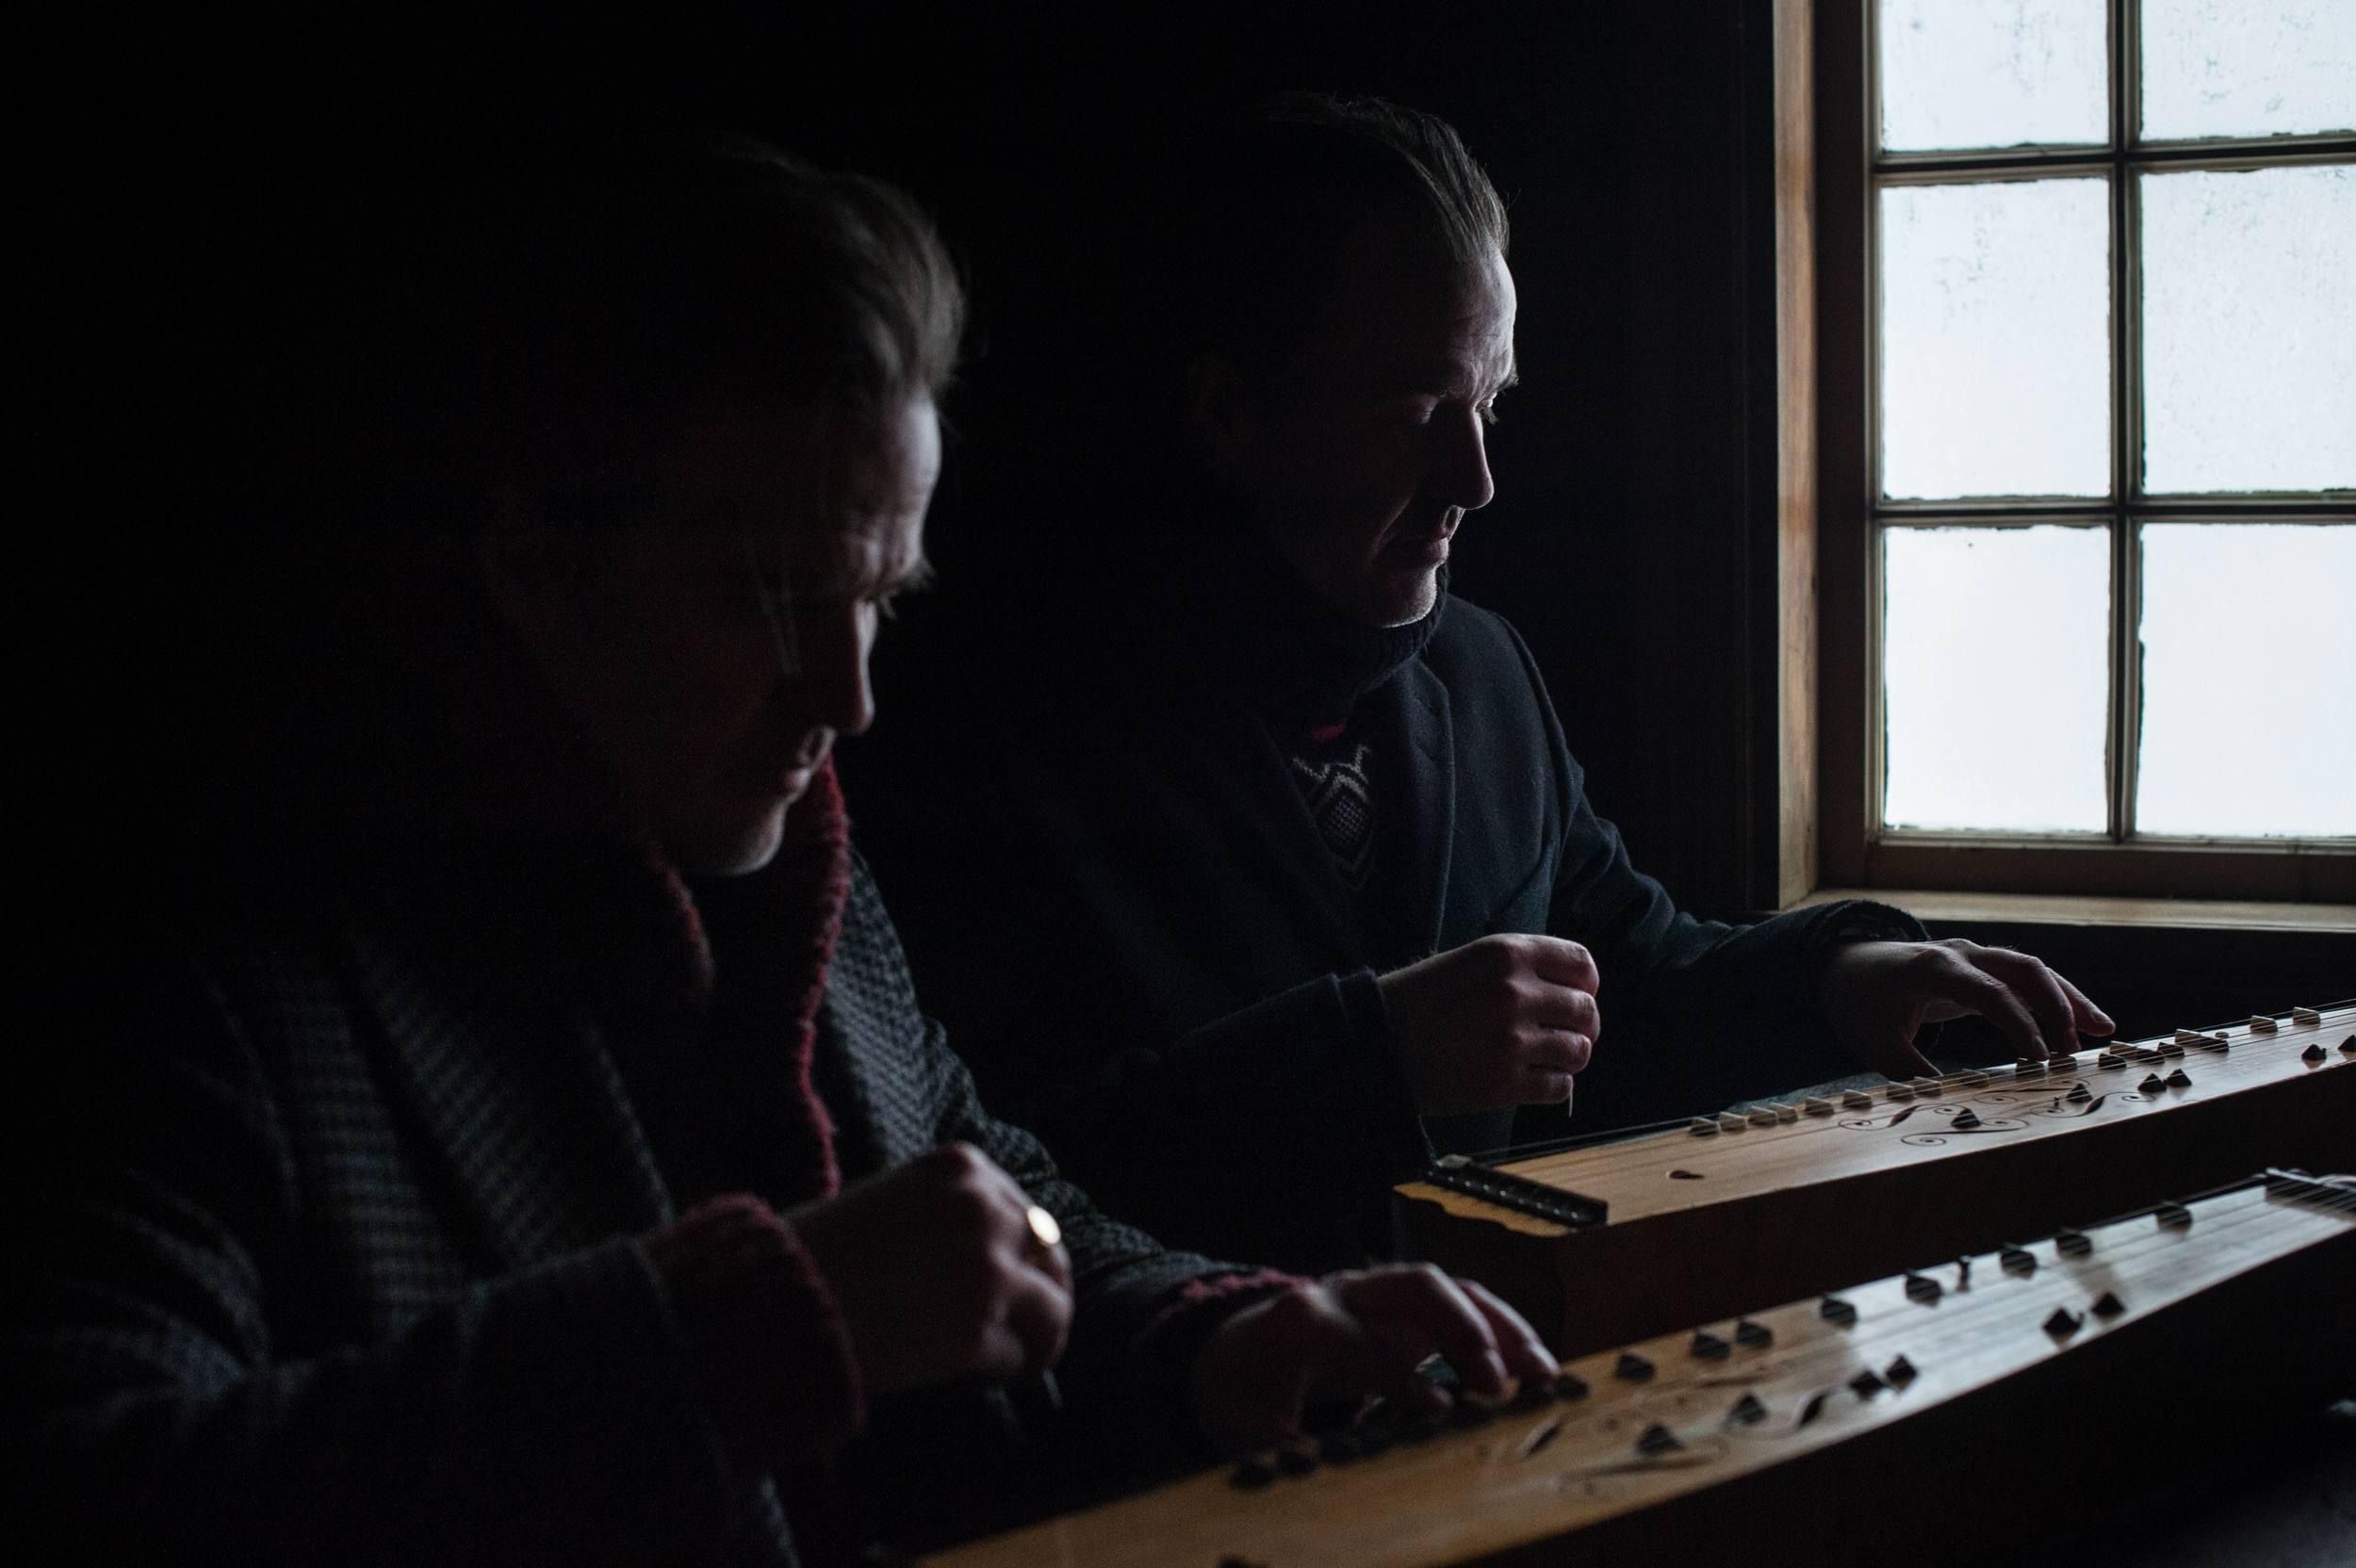 Ole og knut Aastad Bråten - foto:Alexander Andersen